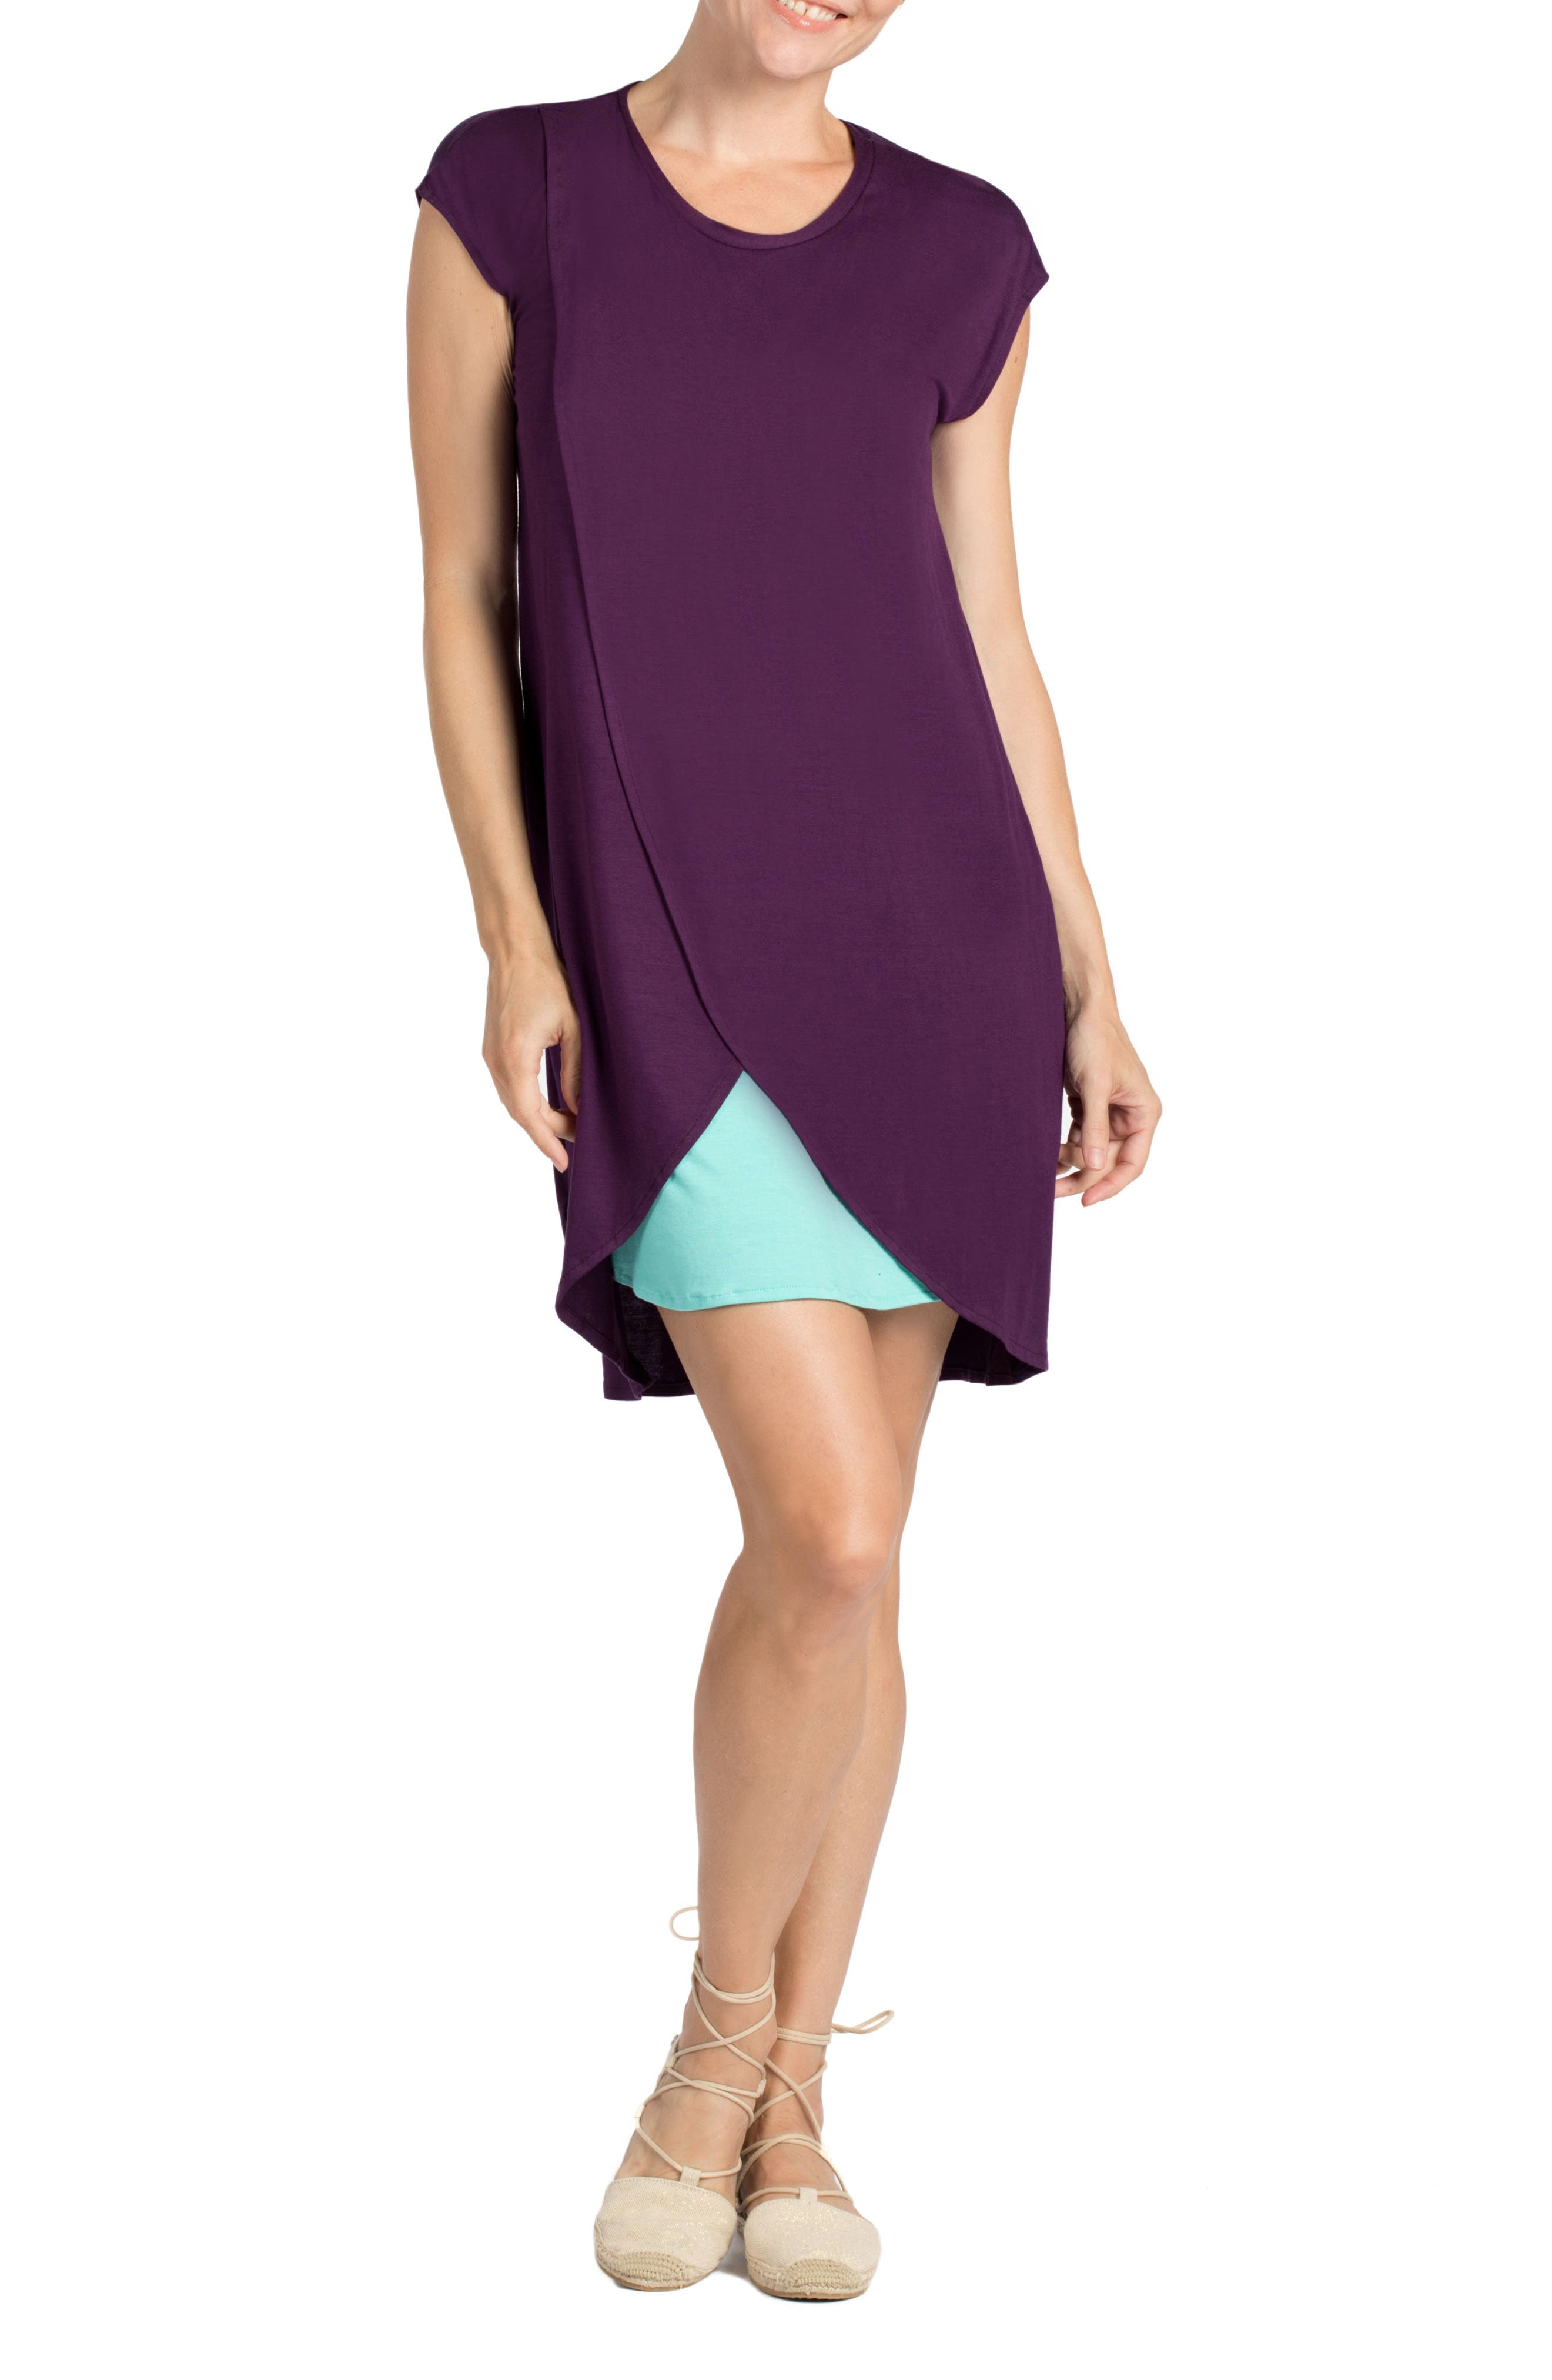 Lille Layered Maternity/Nursing Sheath Dress,                             Alternate thumbnail 4, color,                             EGGPLANT/ DARK MINT CONTRAST